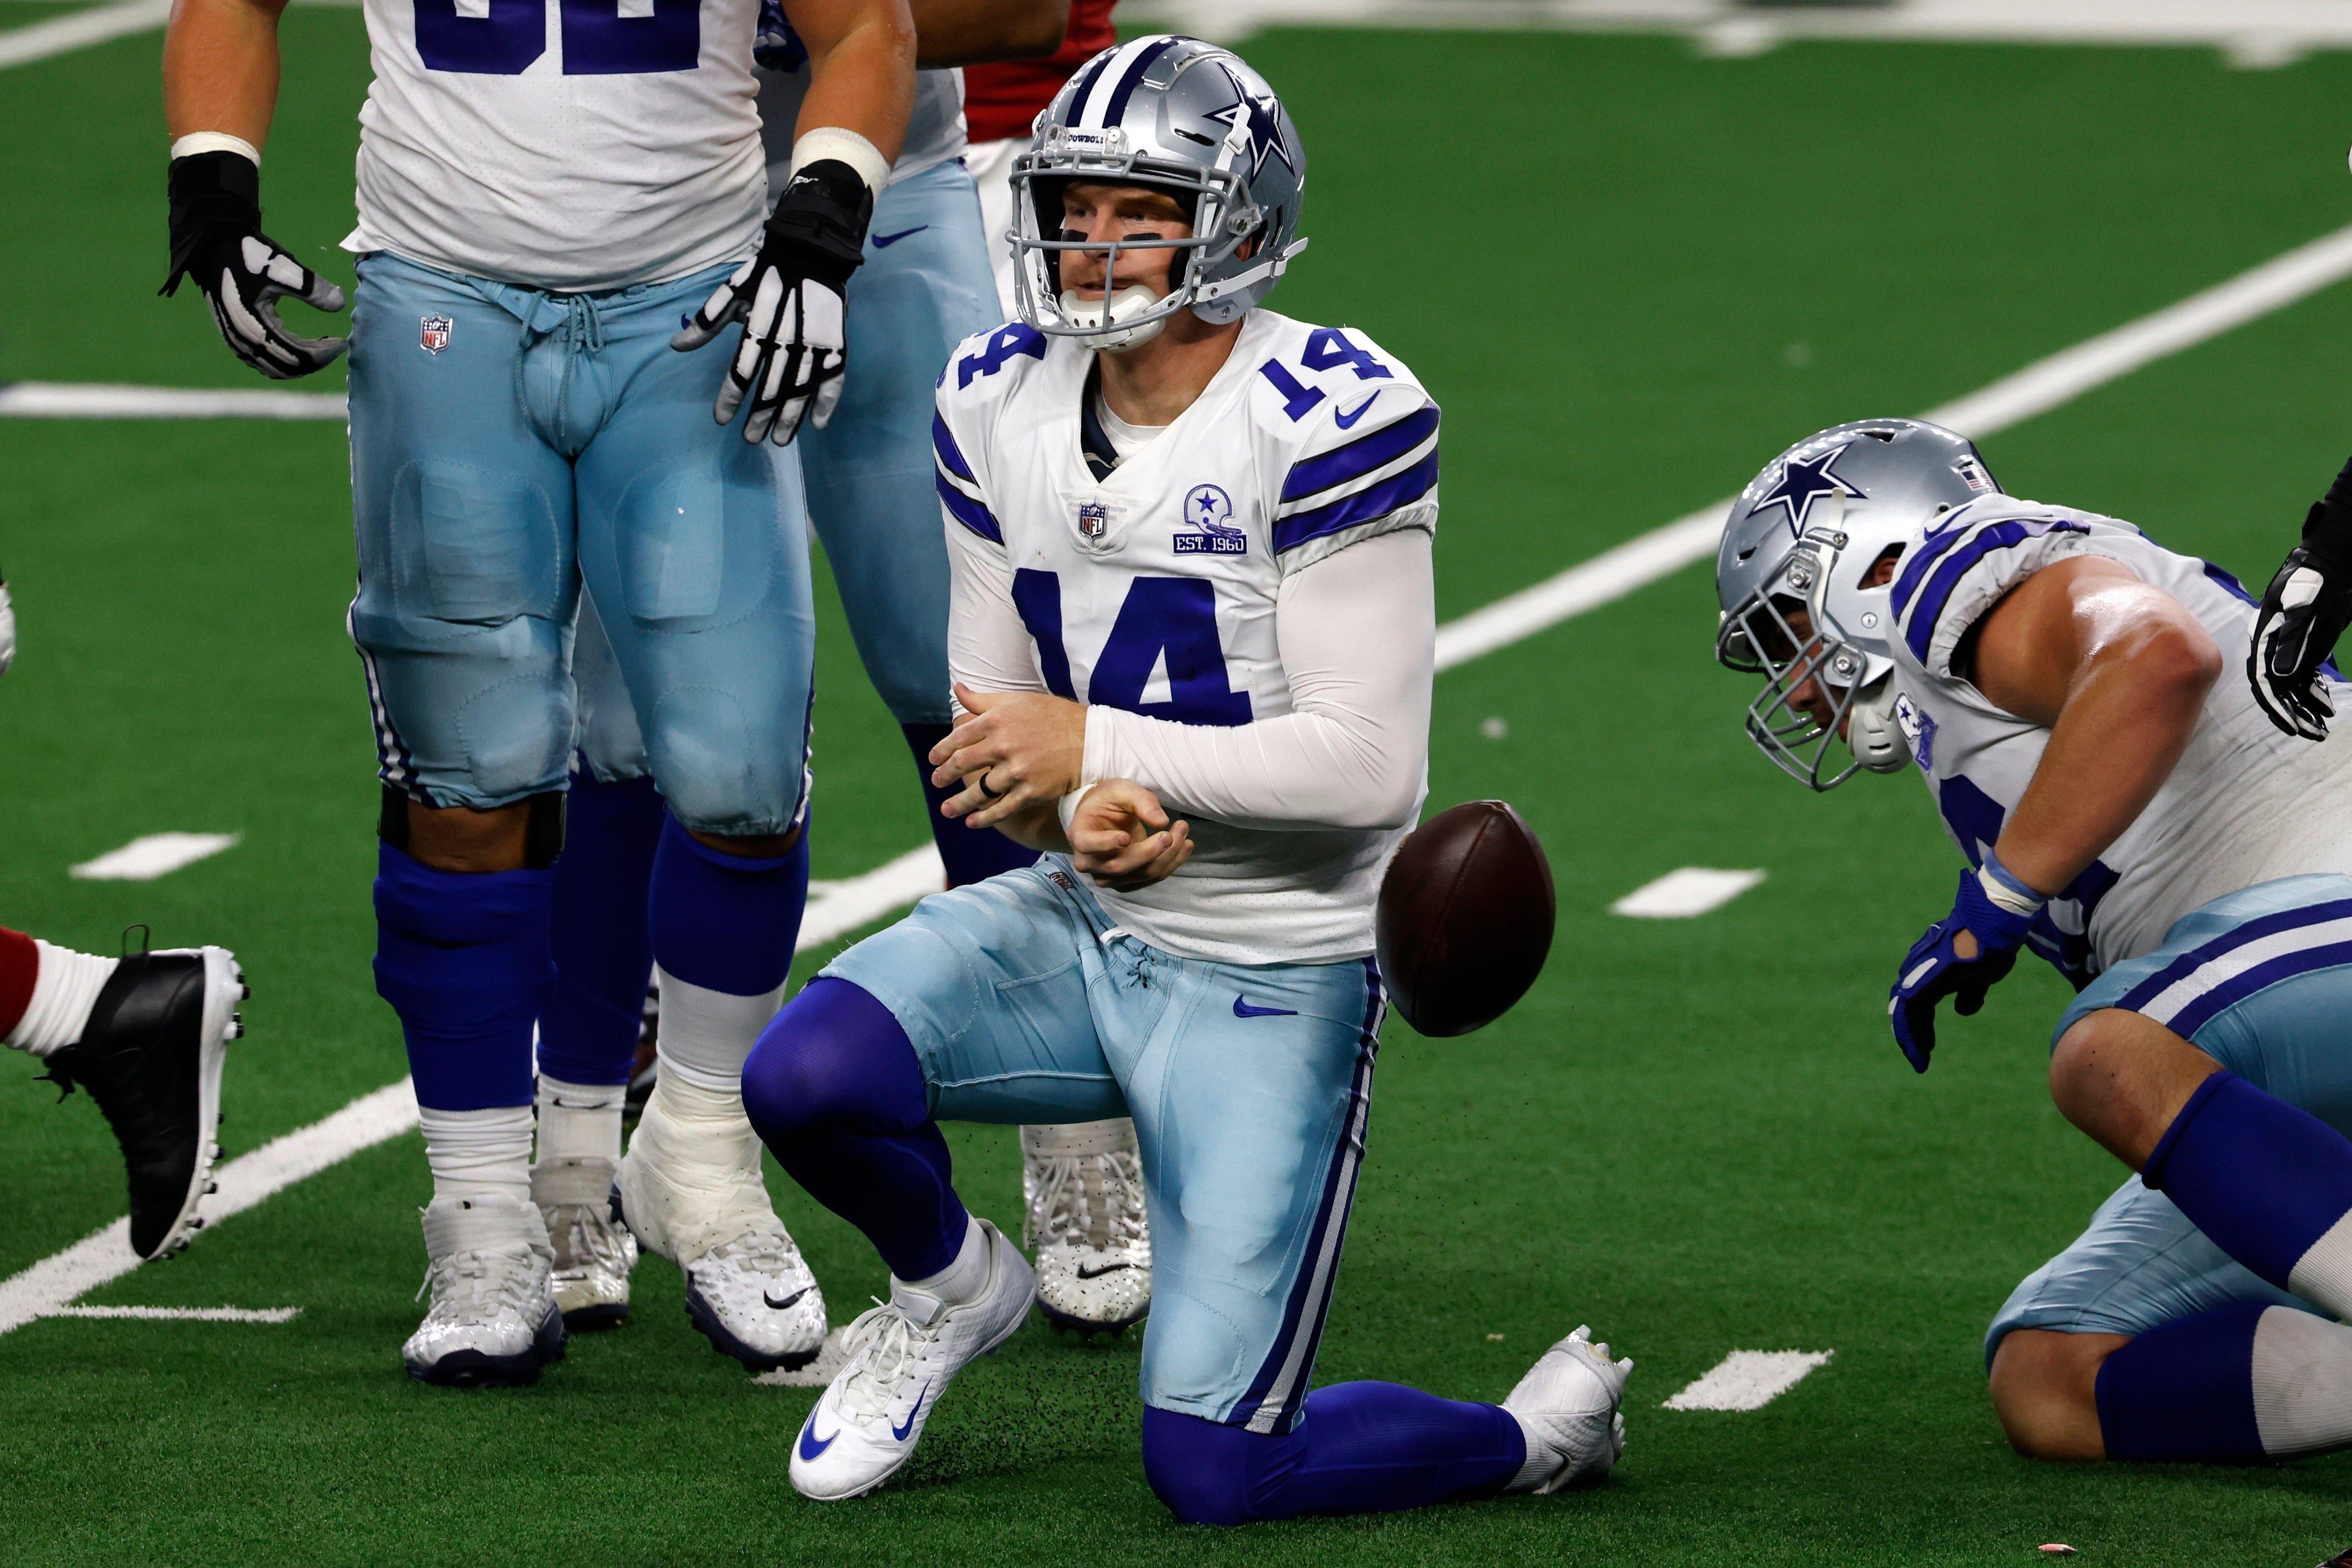 Cowboys Come Undone Suffer Blowout Loss To Cardinals In First Game Without Dak Prescott Dak Prescott Cowboys Dak